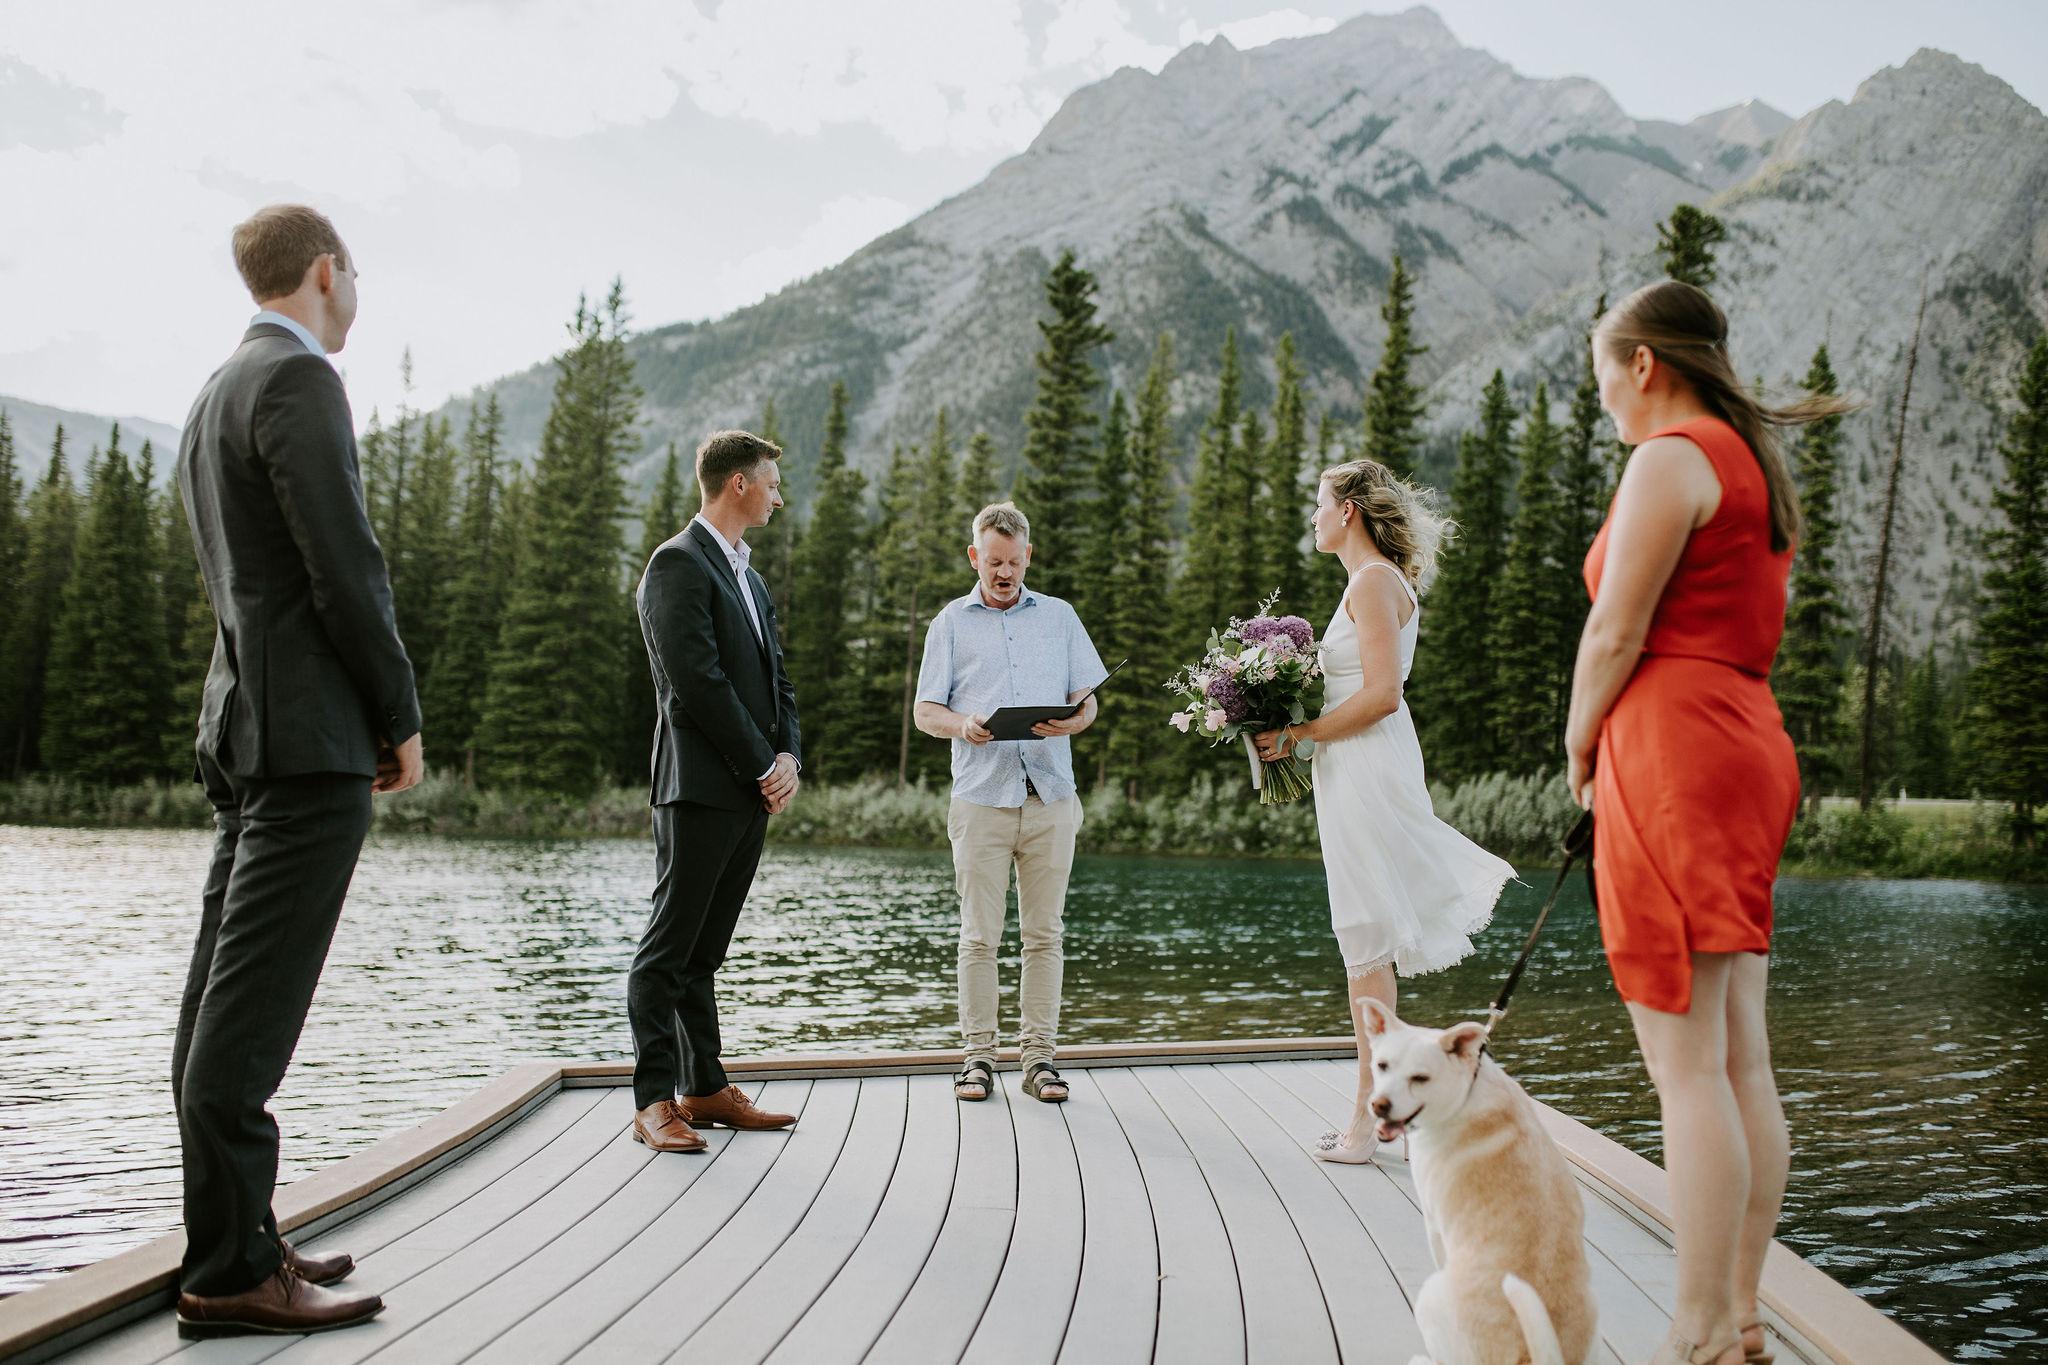 Elopement on a dock at Lake Minnewanka, Banff